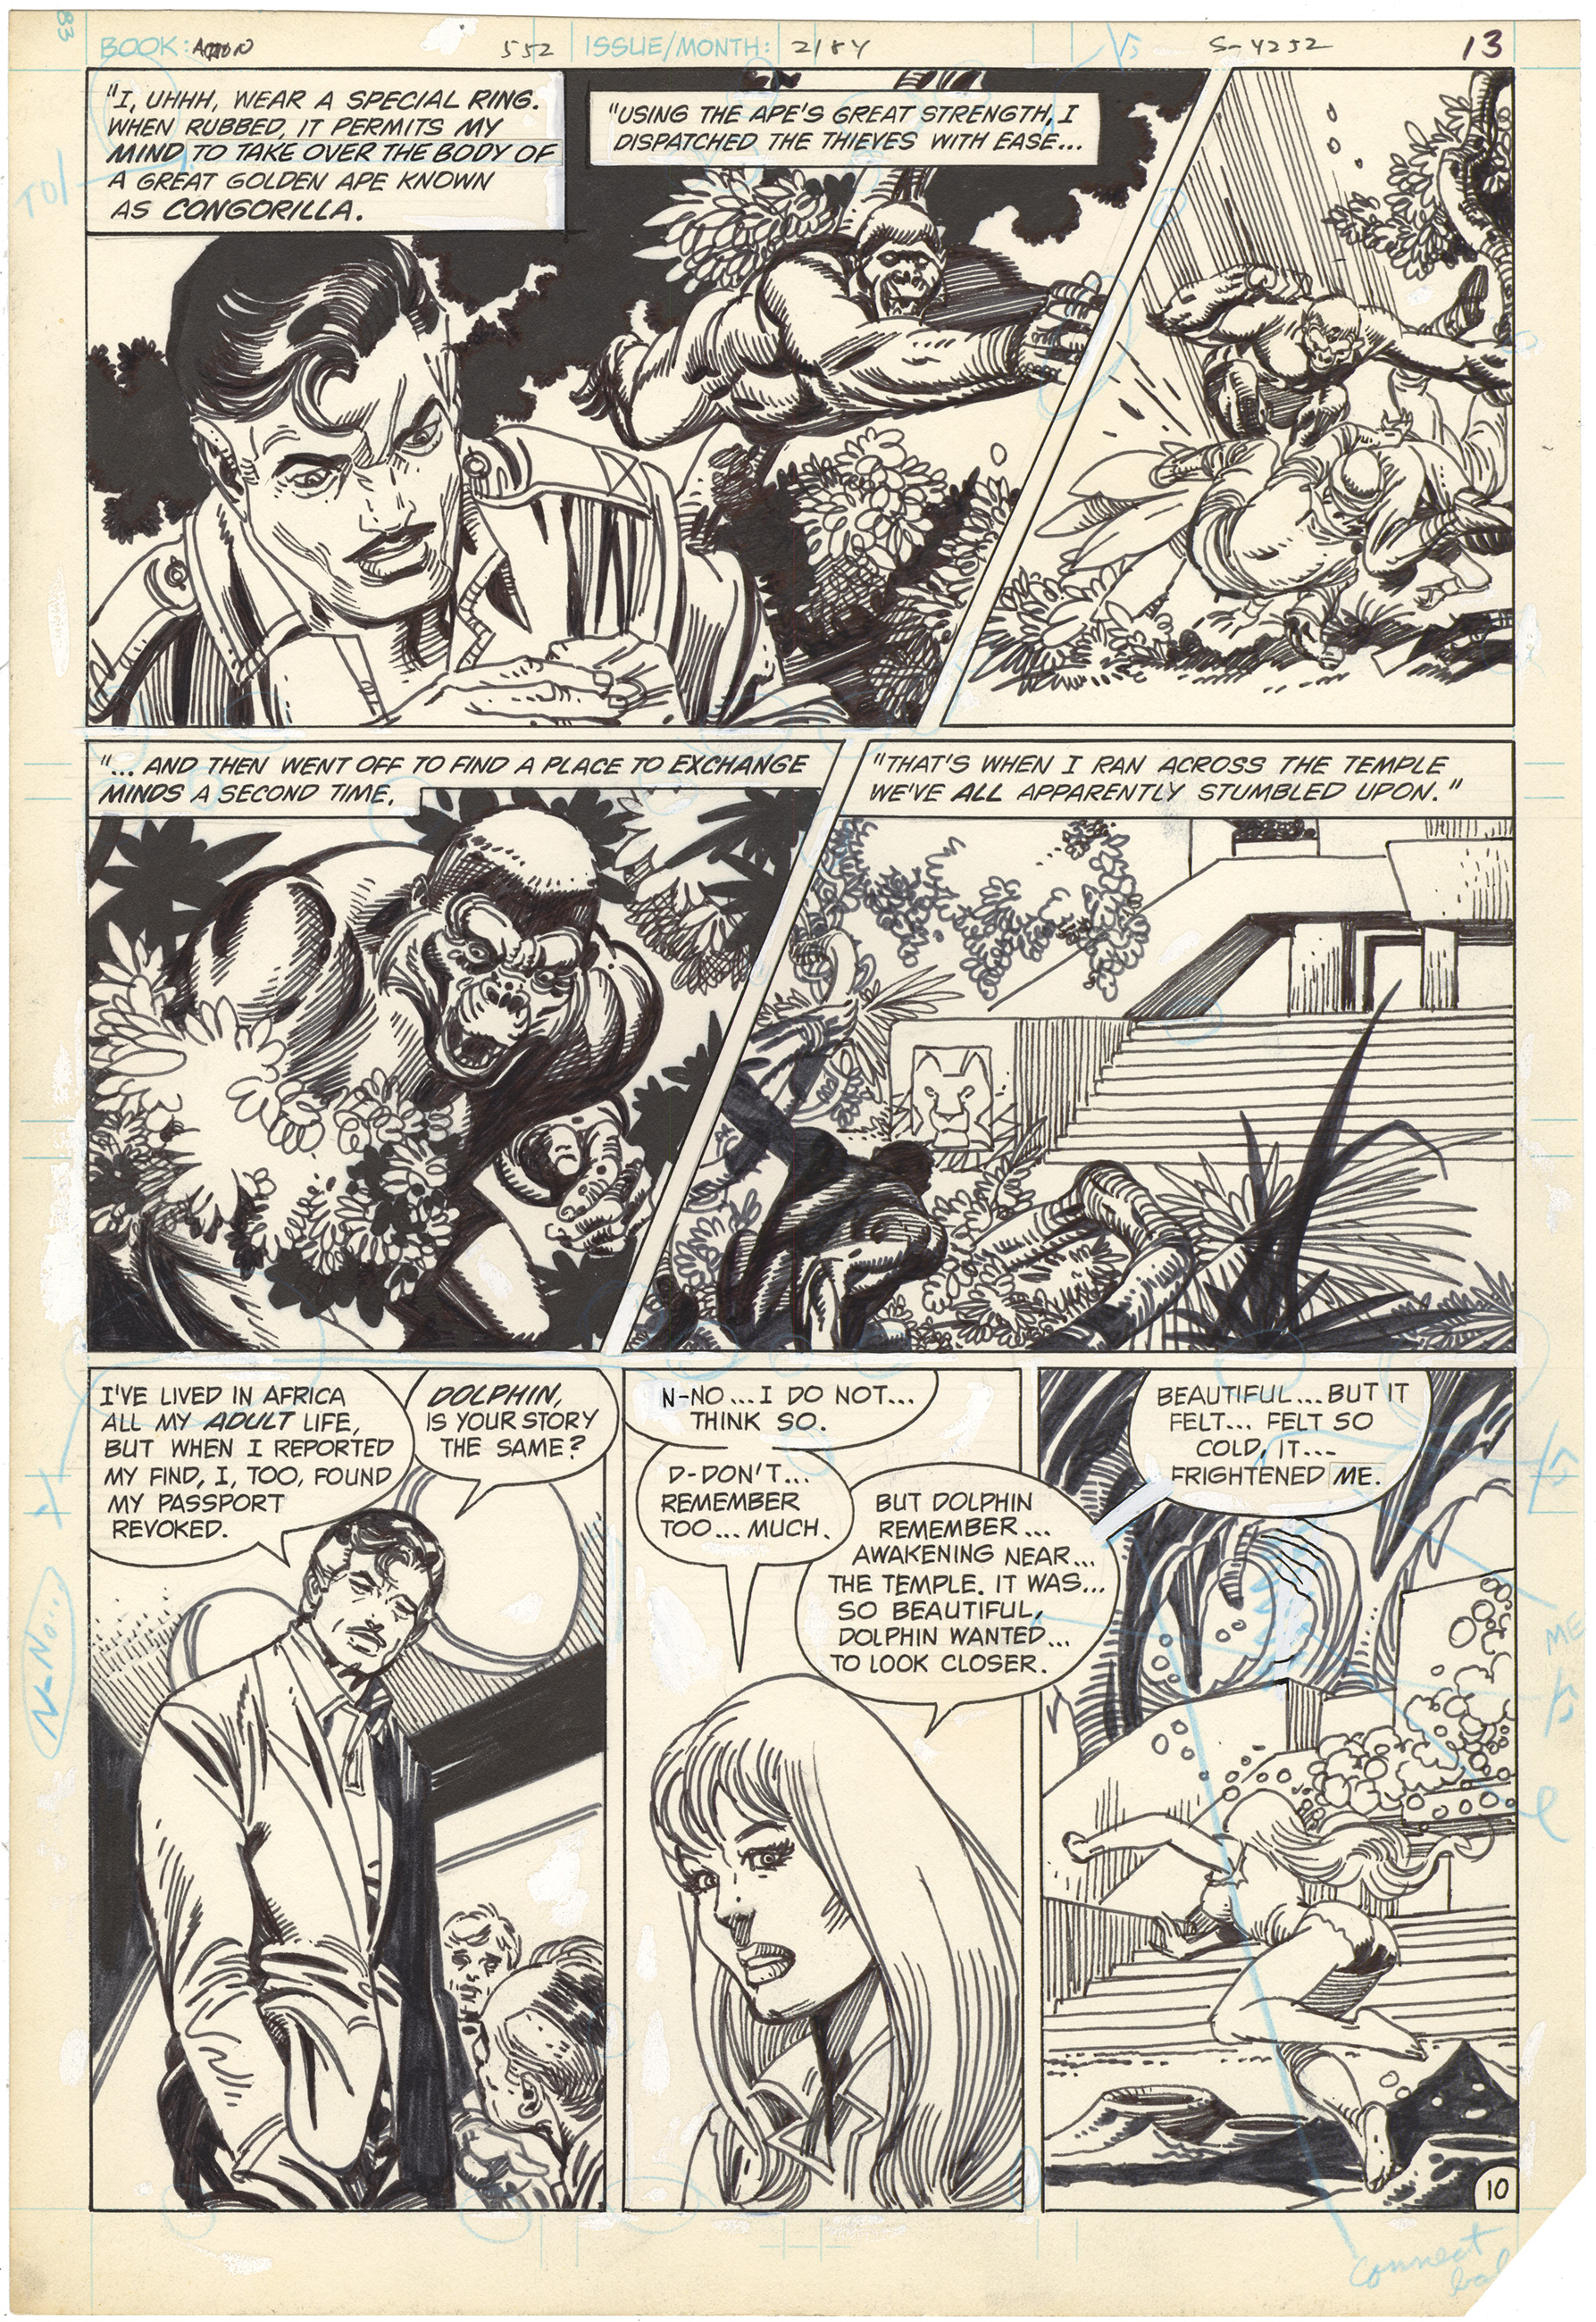 Action Comics #552 p10 (Dolphin+Congorilla)